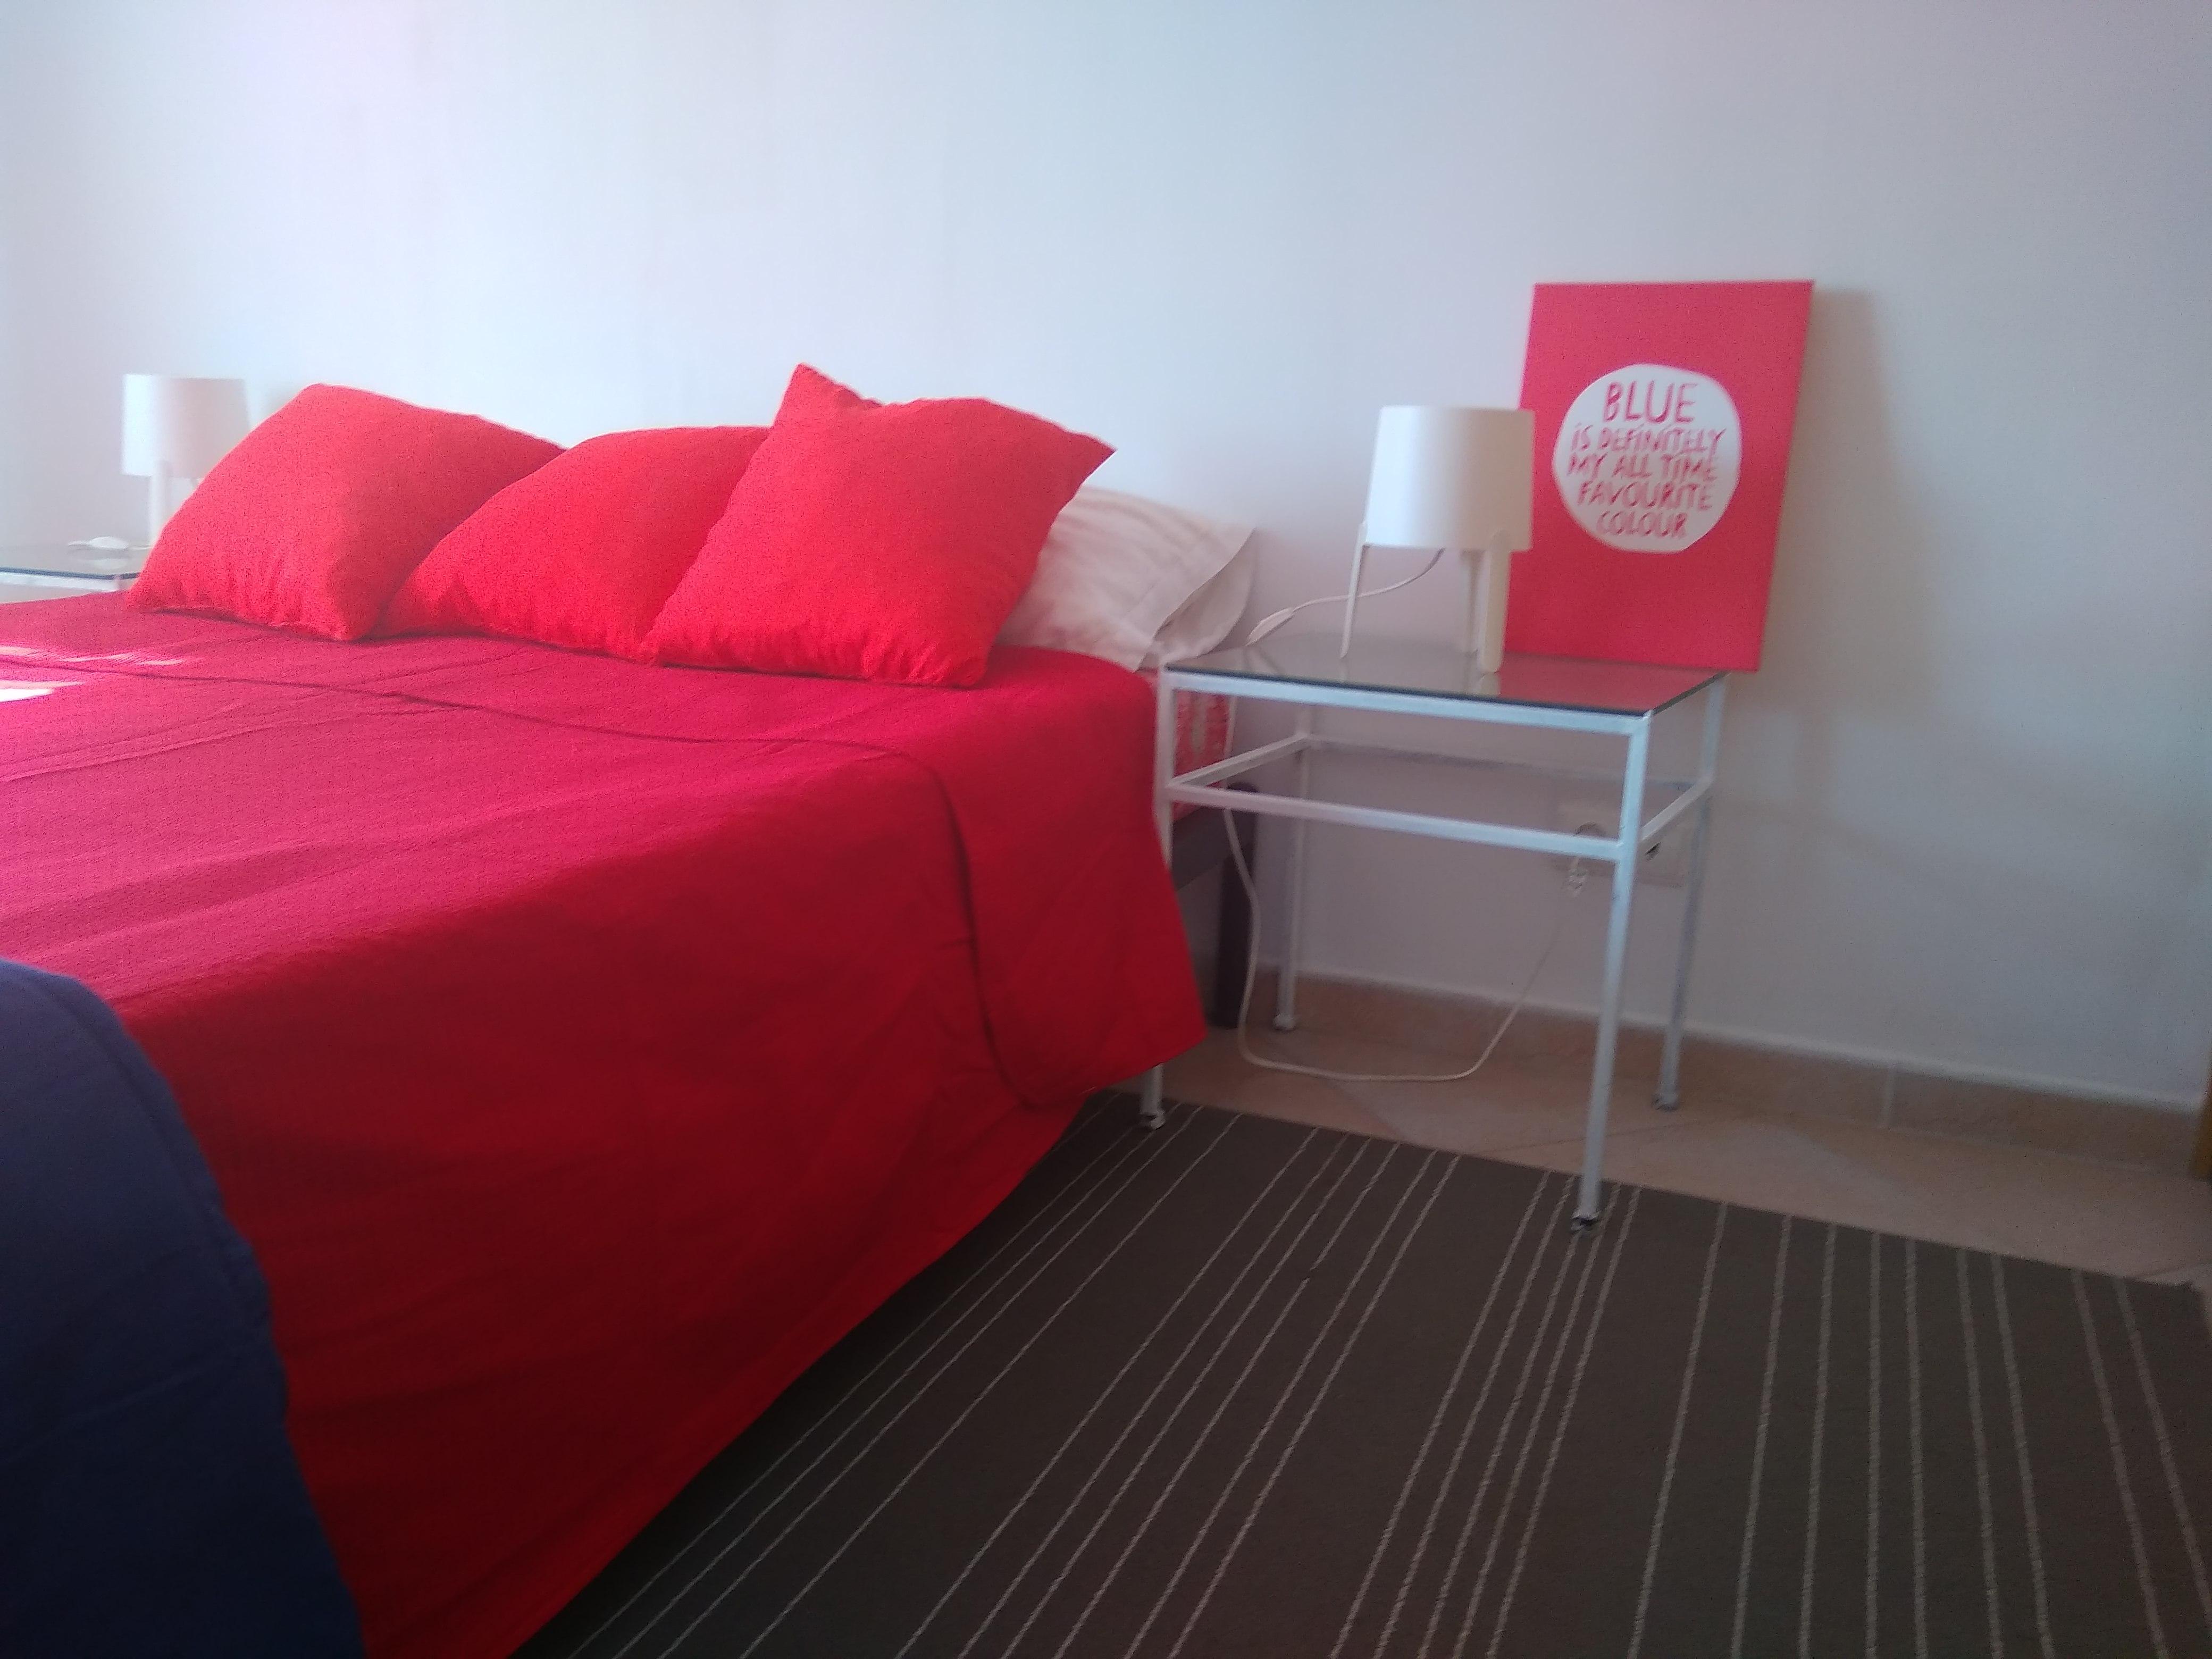 Location appartements et villas de vacance, T2 Sunny Apartment With Panoramic View à Portimão, Portugal Algarve, REF_IMG_5745_5751